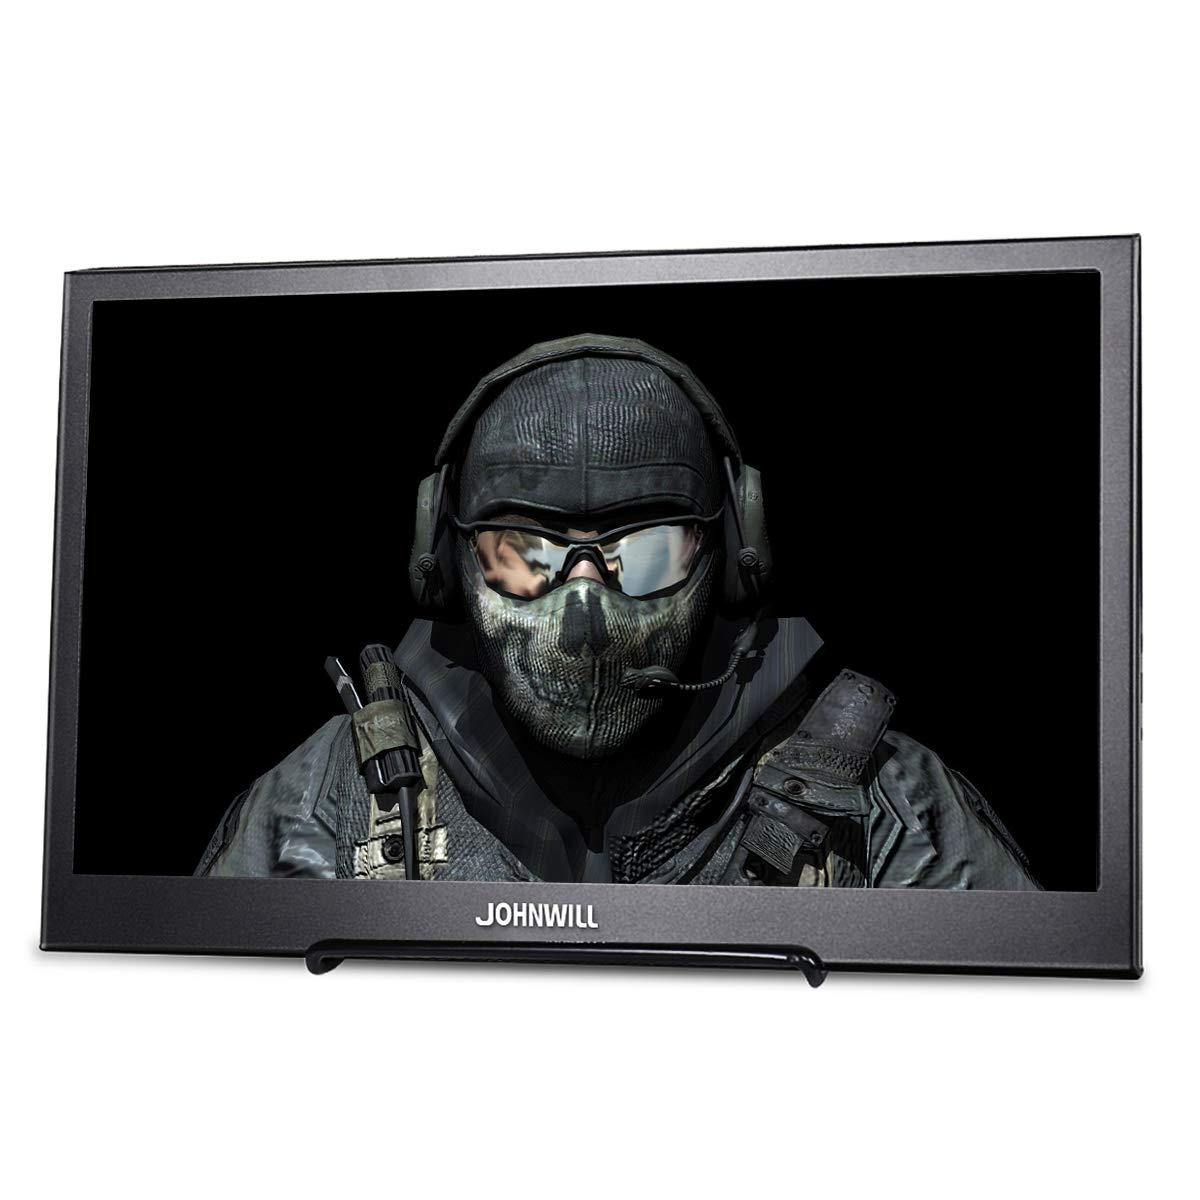 JOHNWILL Monitor portátil 13.3 Pulgadas IPS Pantalla Full HD 1920 x 1080 Monitor Ultra Delgado Carcasa de Metal Negro